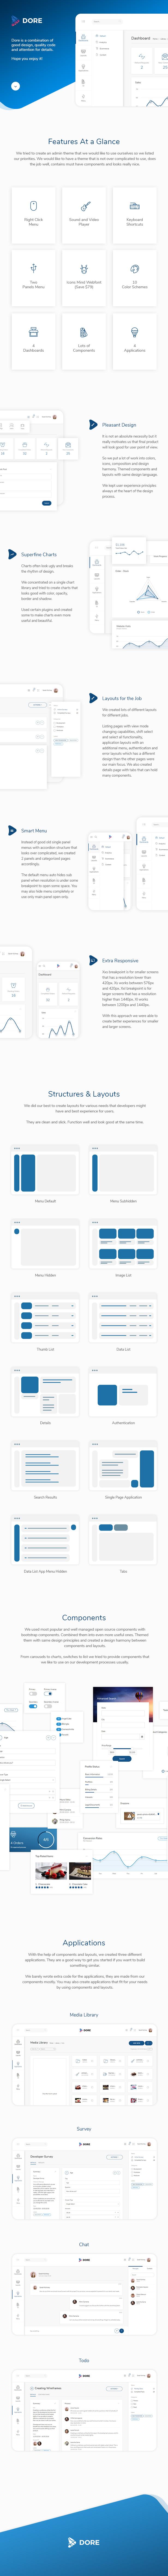 Dore jQuery - Bootstrap 4 Admin Template - 4